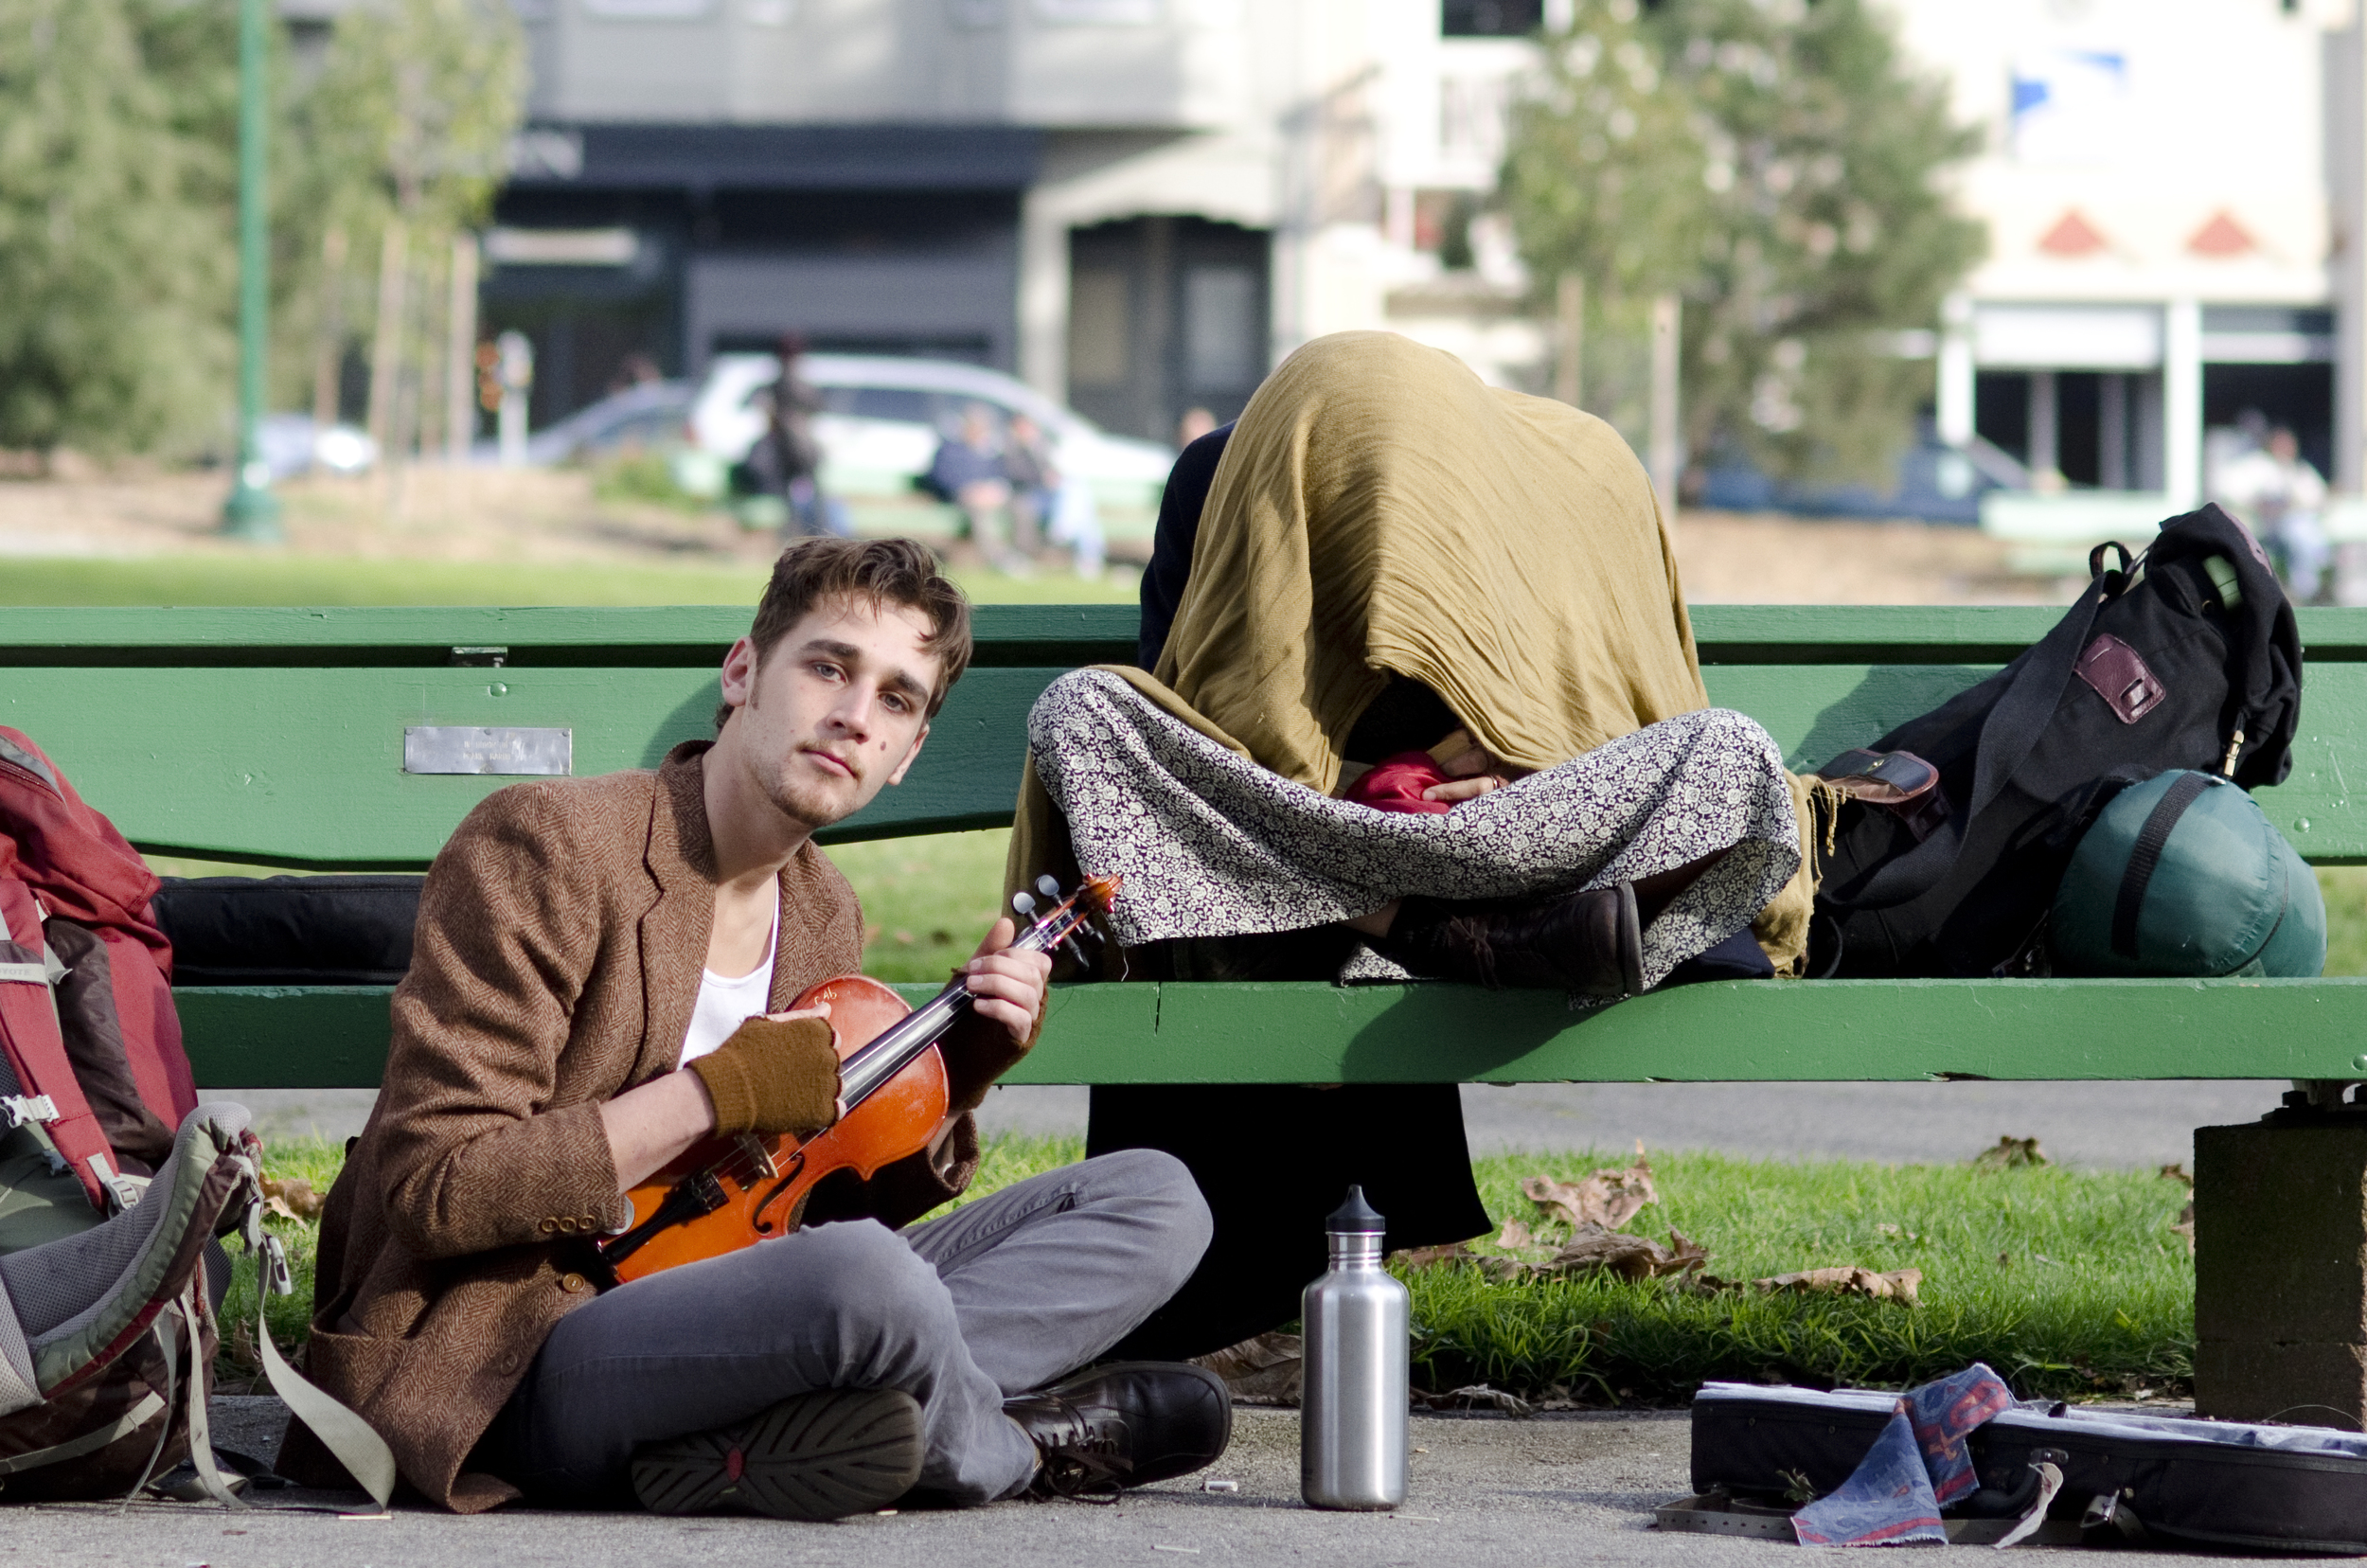 Travelers hang out at Washington Square in San Francisco, Calif. Monday Jan. 3, 2013